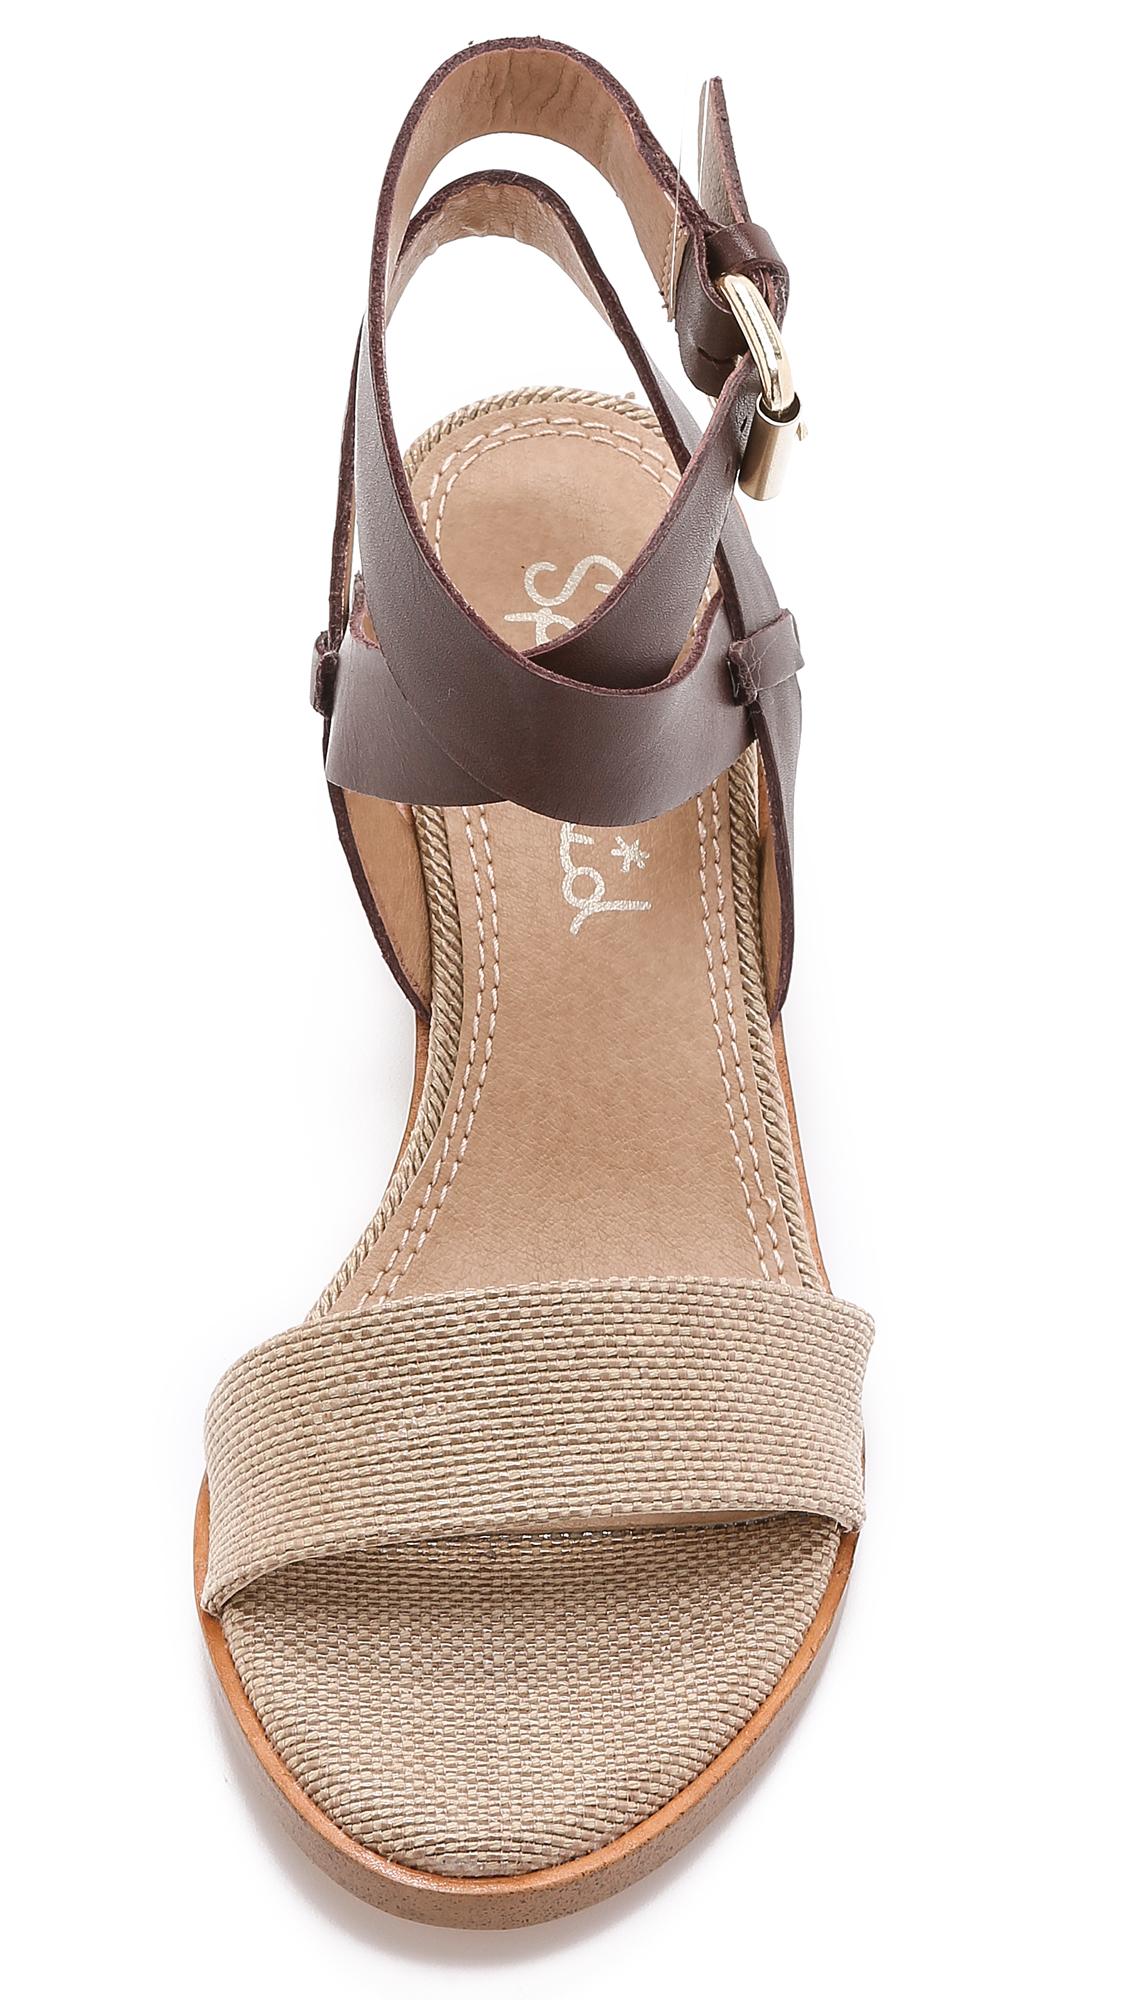 8c0be6e6e99 Splendid Kayman Block Heel Sandals